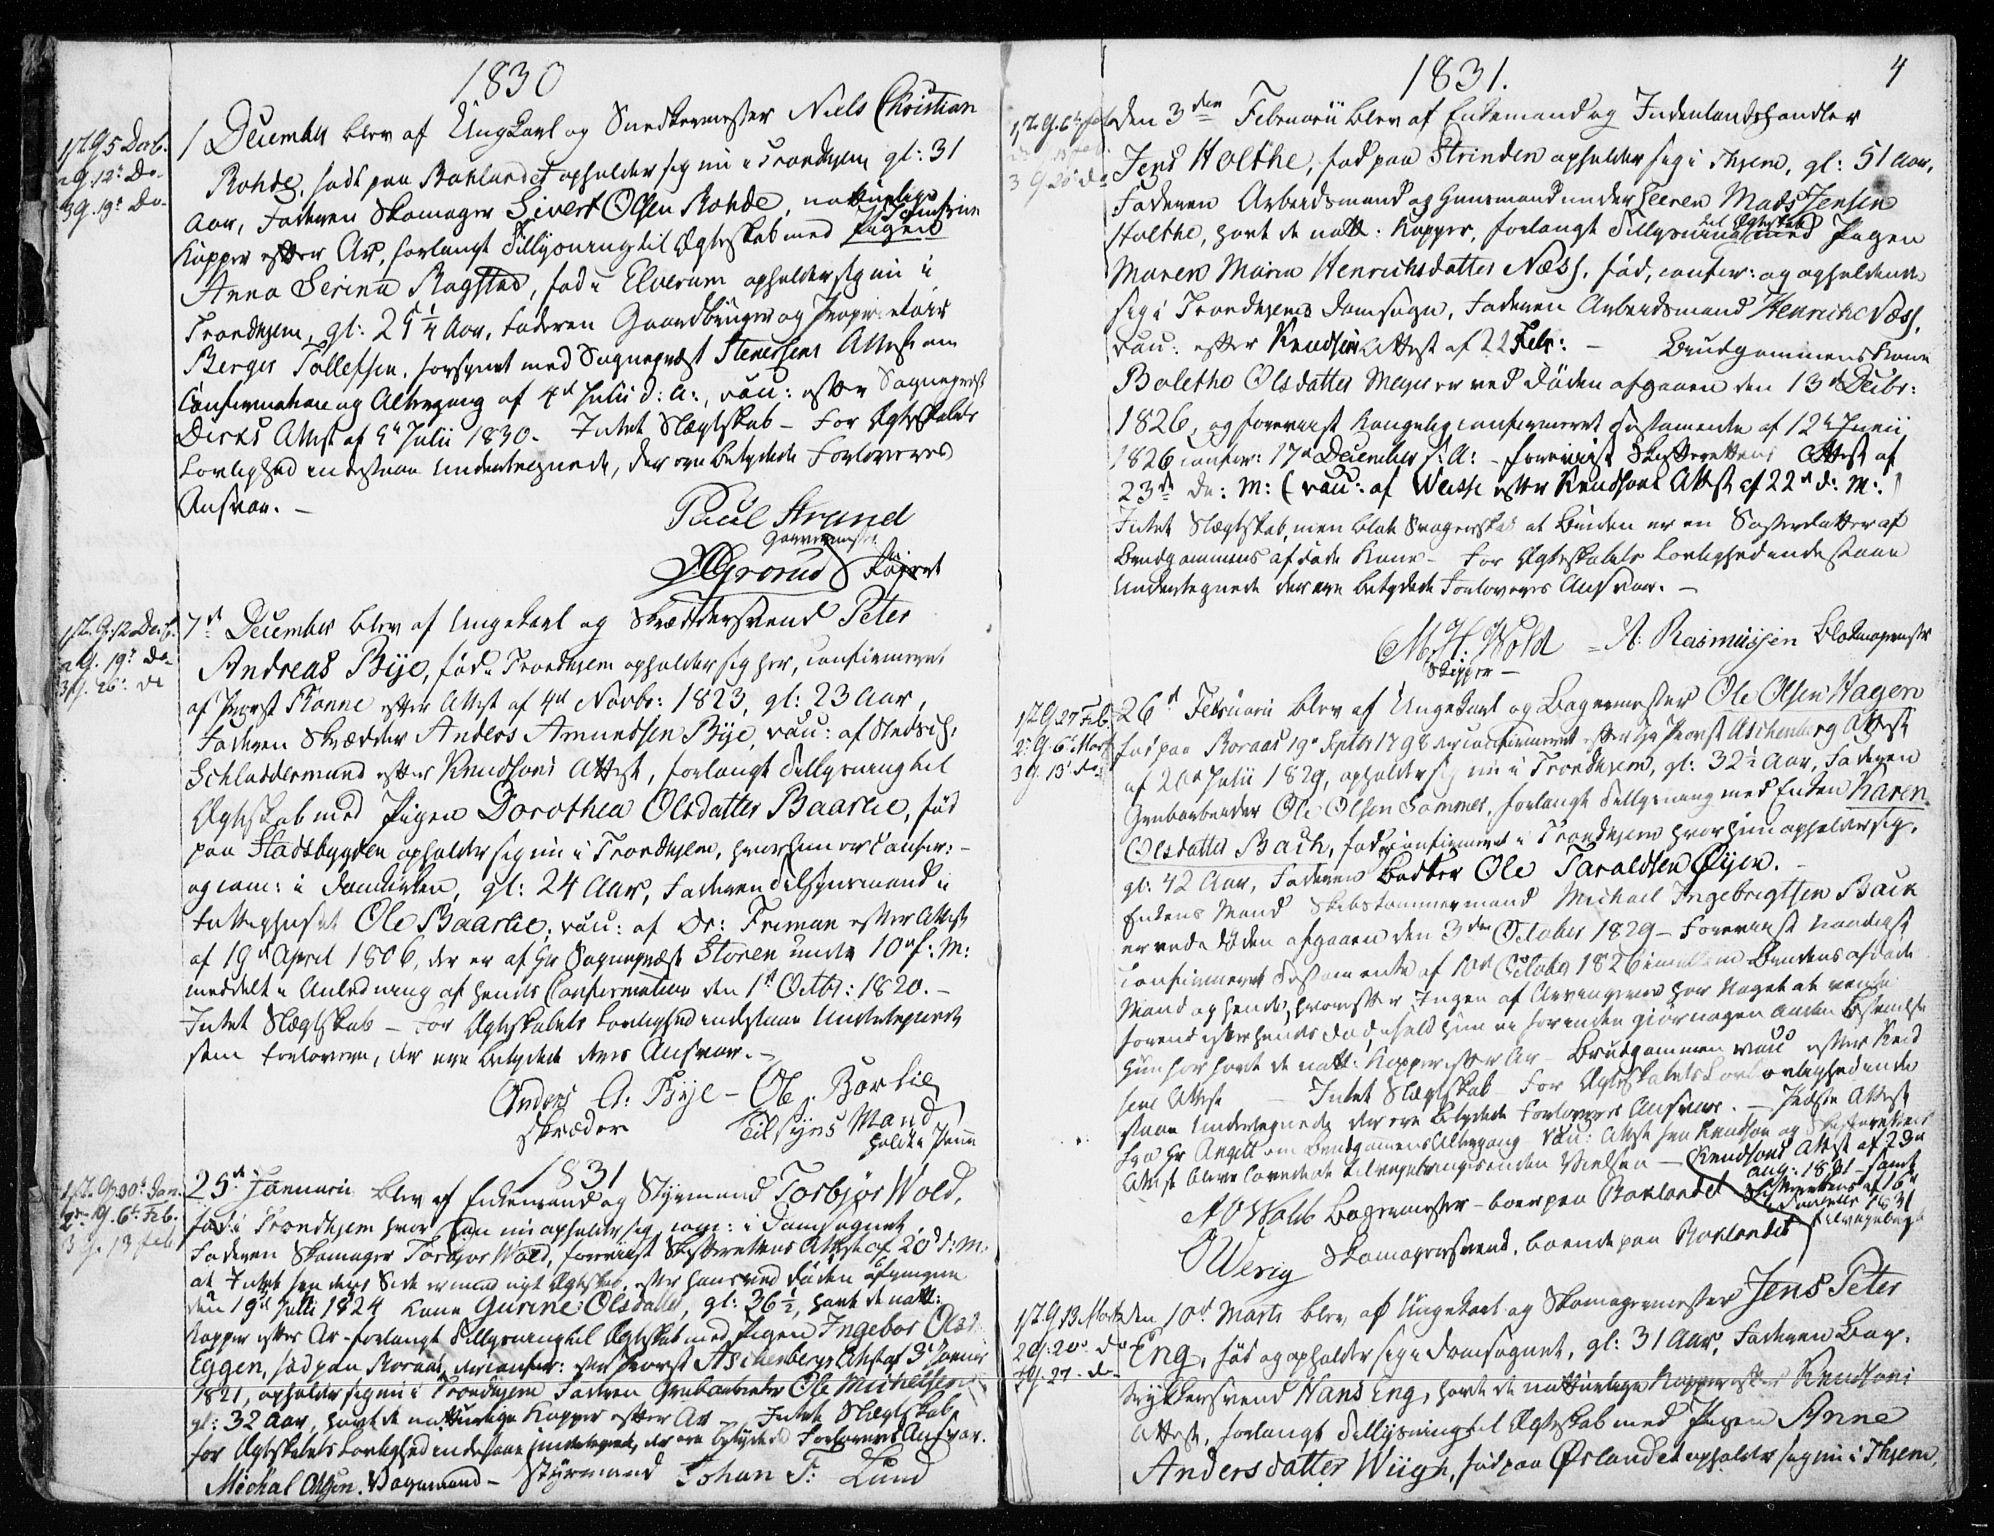 SAT, Ministerialprotokoller, klokkerbøker og fødselsregistre - Sør-Trøndelag, 601/L0046: Parish register (official) no. 601A14, 1830-1841, p. 4